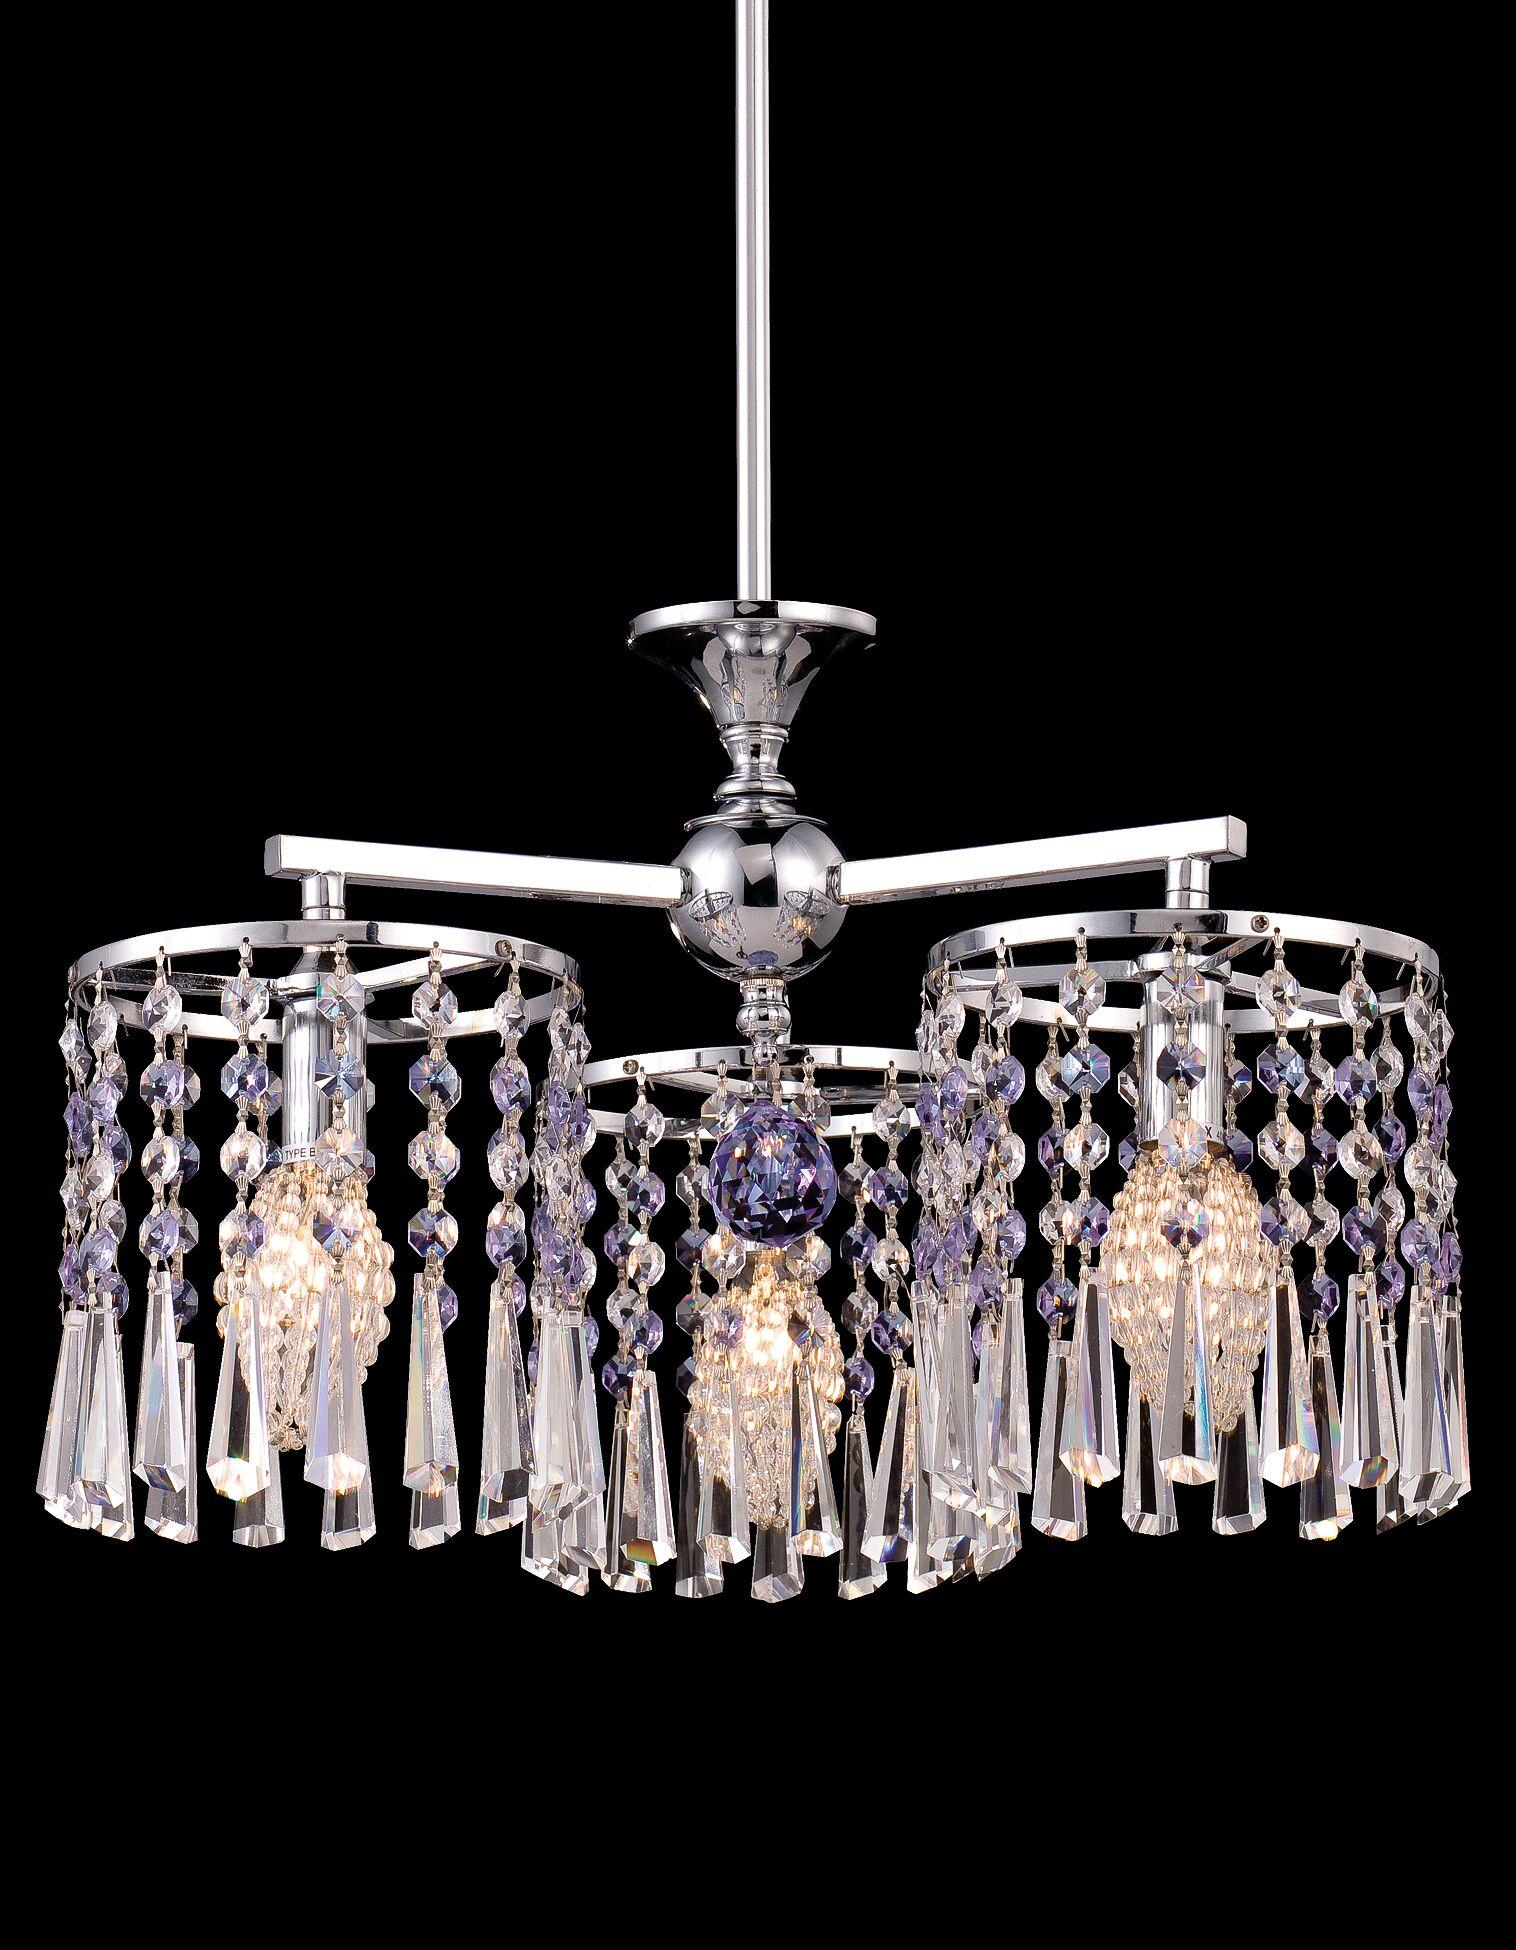 Dowdy 3-Light Crystal Chandelier